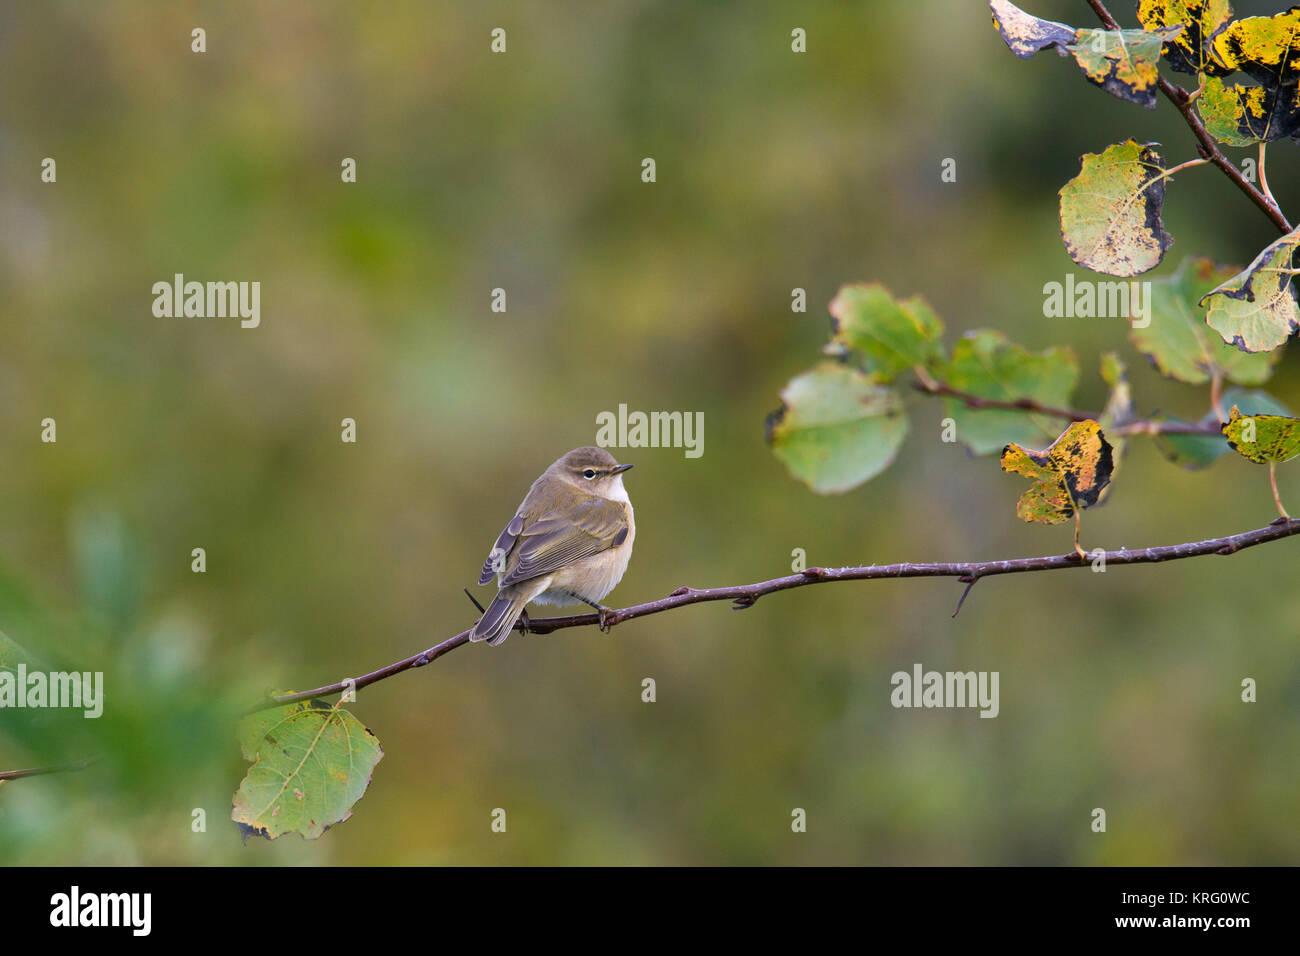 Siberian chiffchaff (Phylloscopus collybita tristis / Phylloscopus tristis) perched in tree in autumn, Sweden - Stock Image